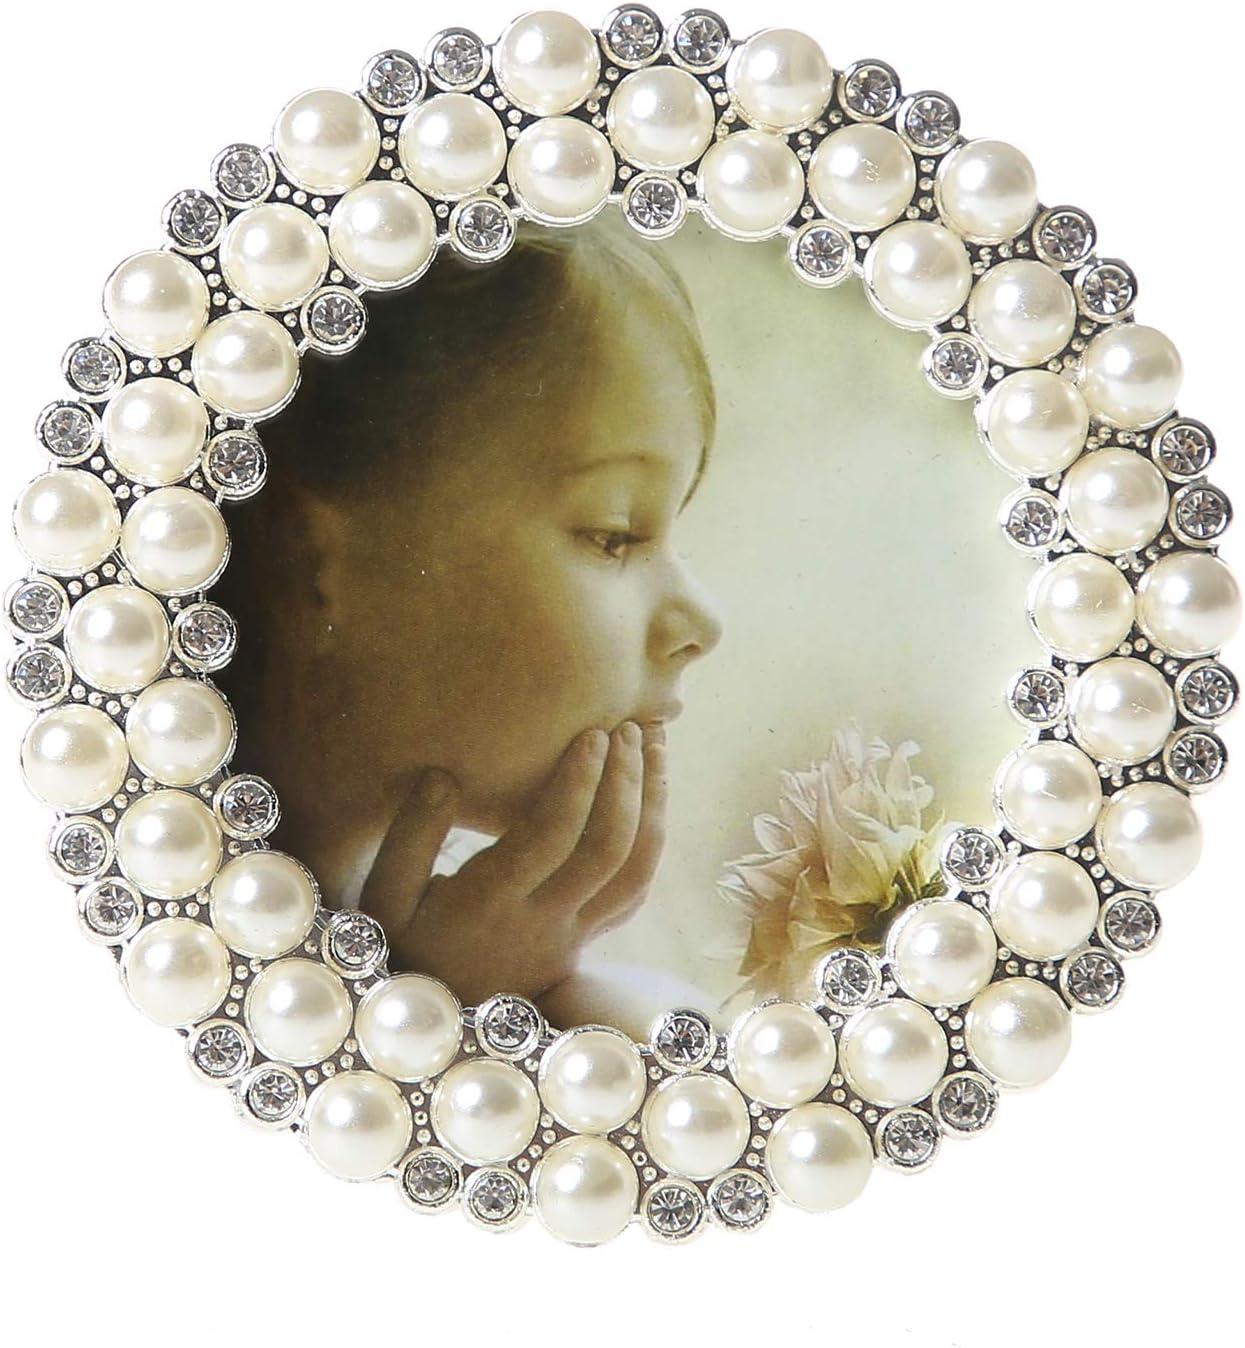 Enchante Accessories Picture Photo Frame Black Ornate Scroll Fleur Vintage 4 x 6